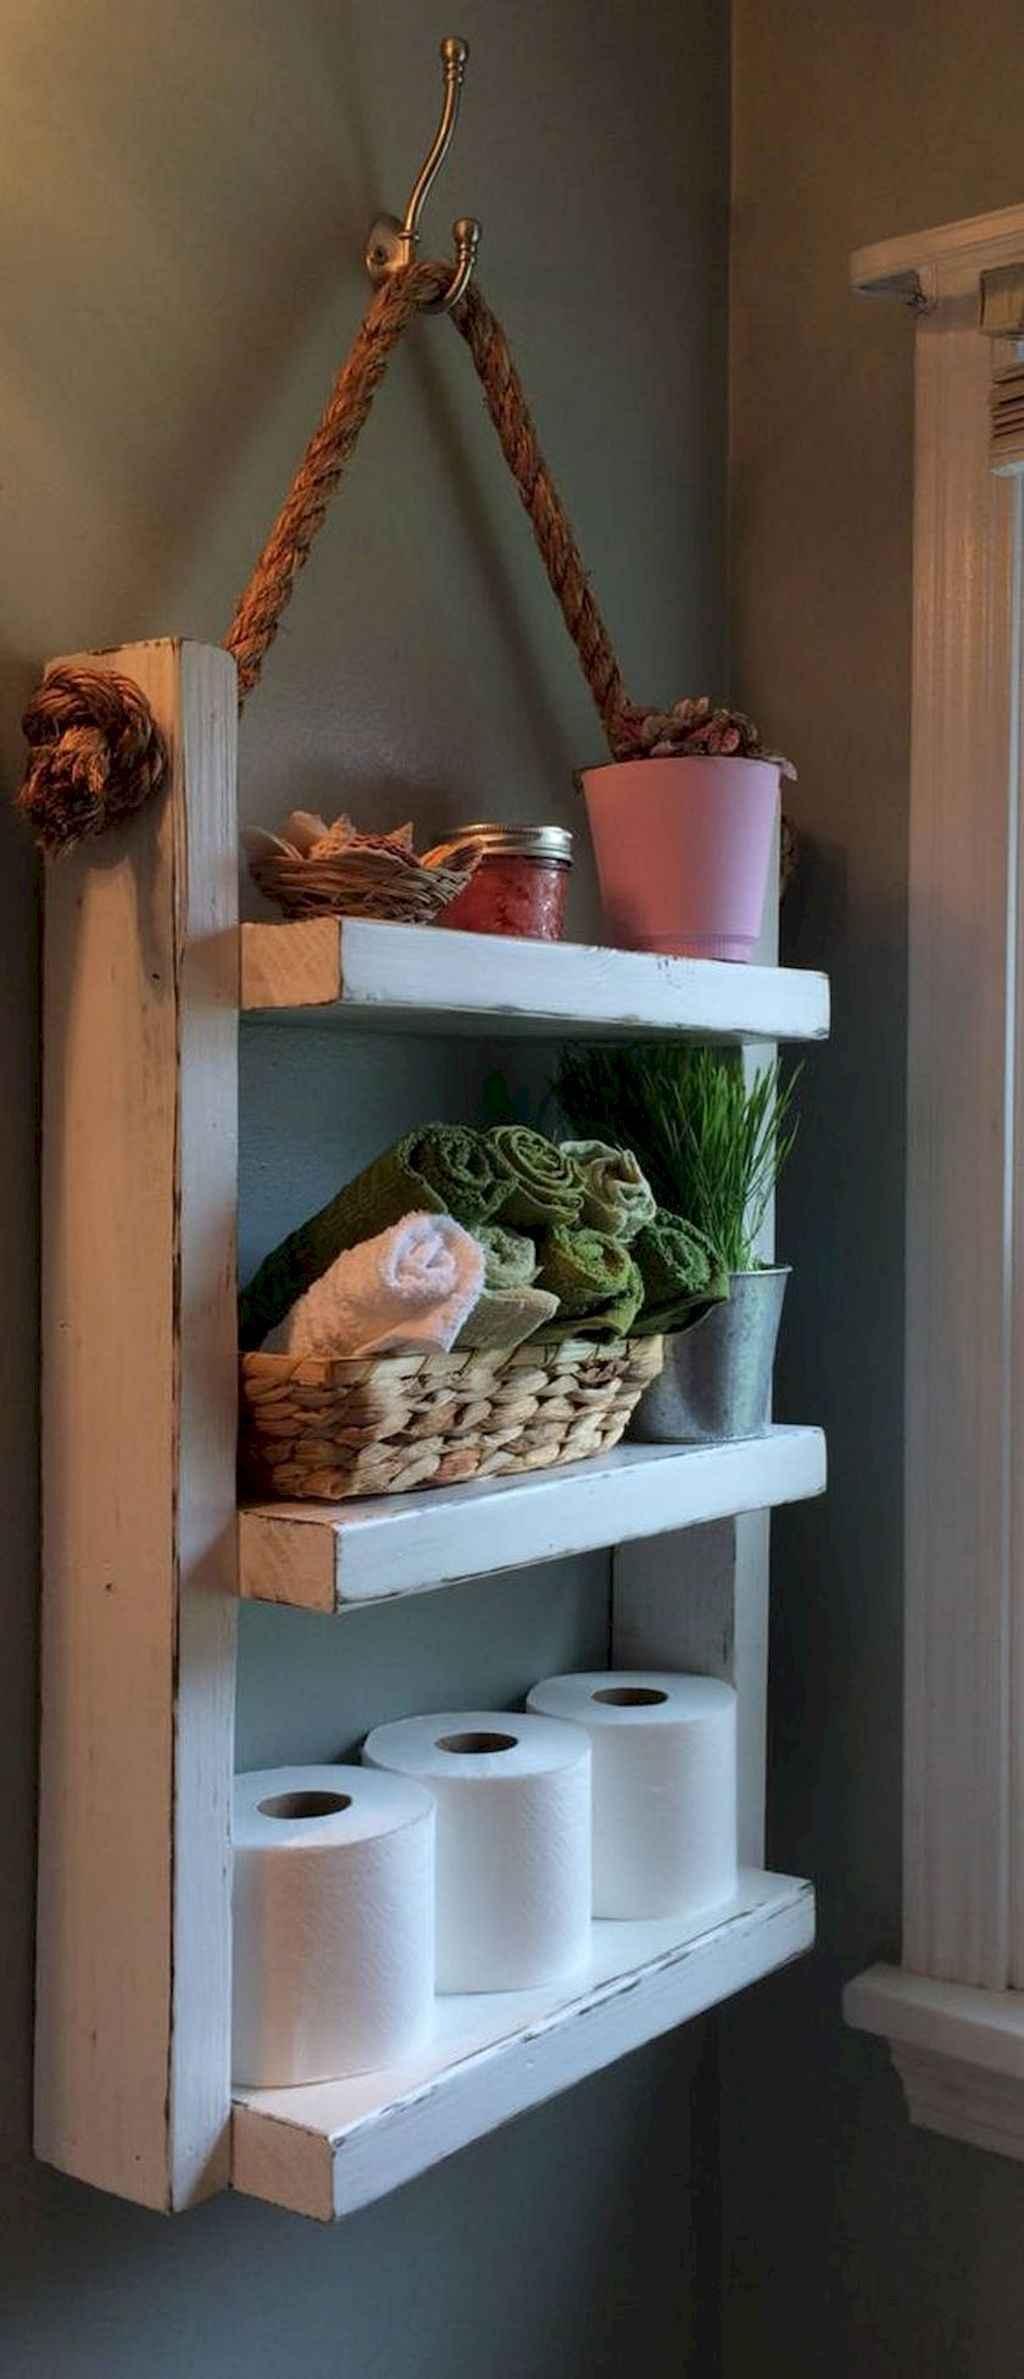 Inspiring rustic bathroom decor ideas (24)